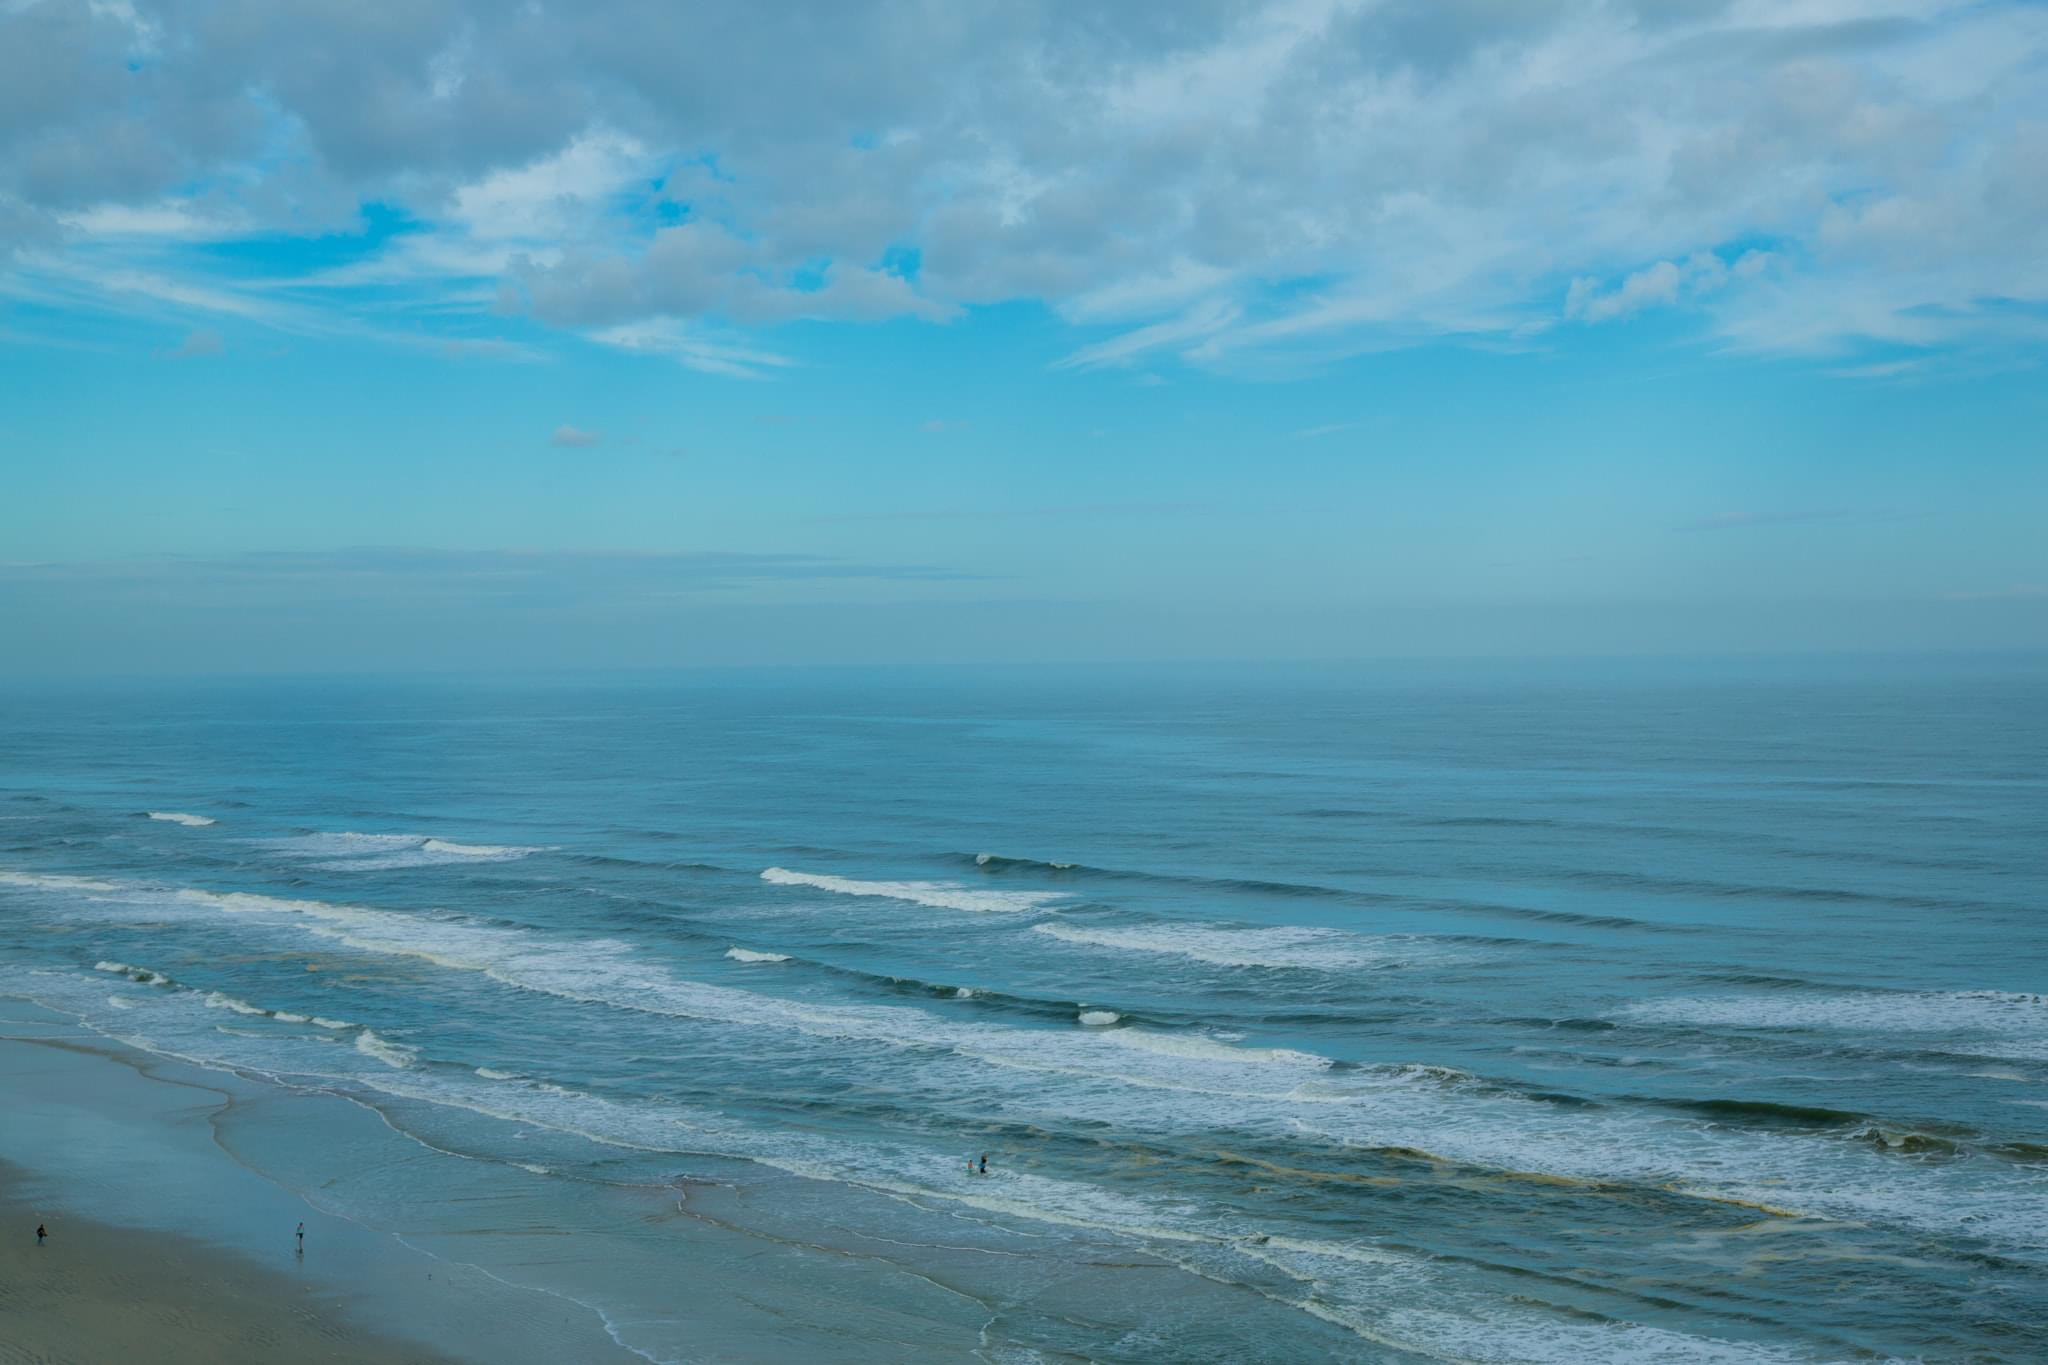 Tennessee Man Drowns at Florida Beach